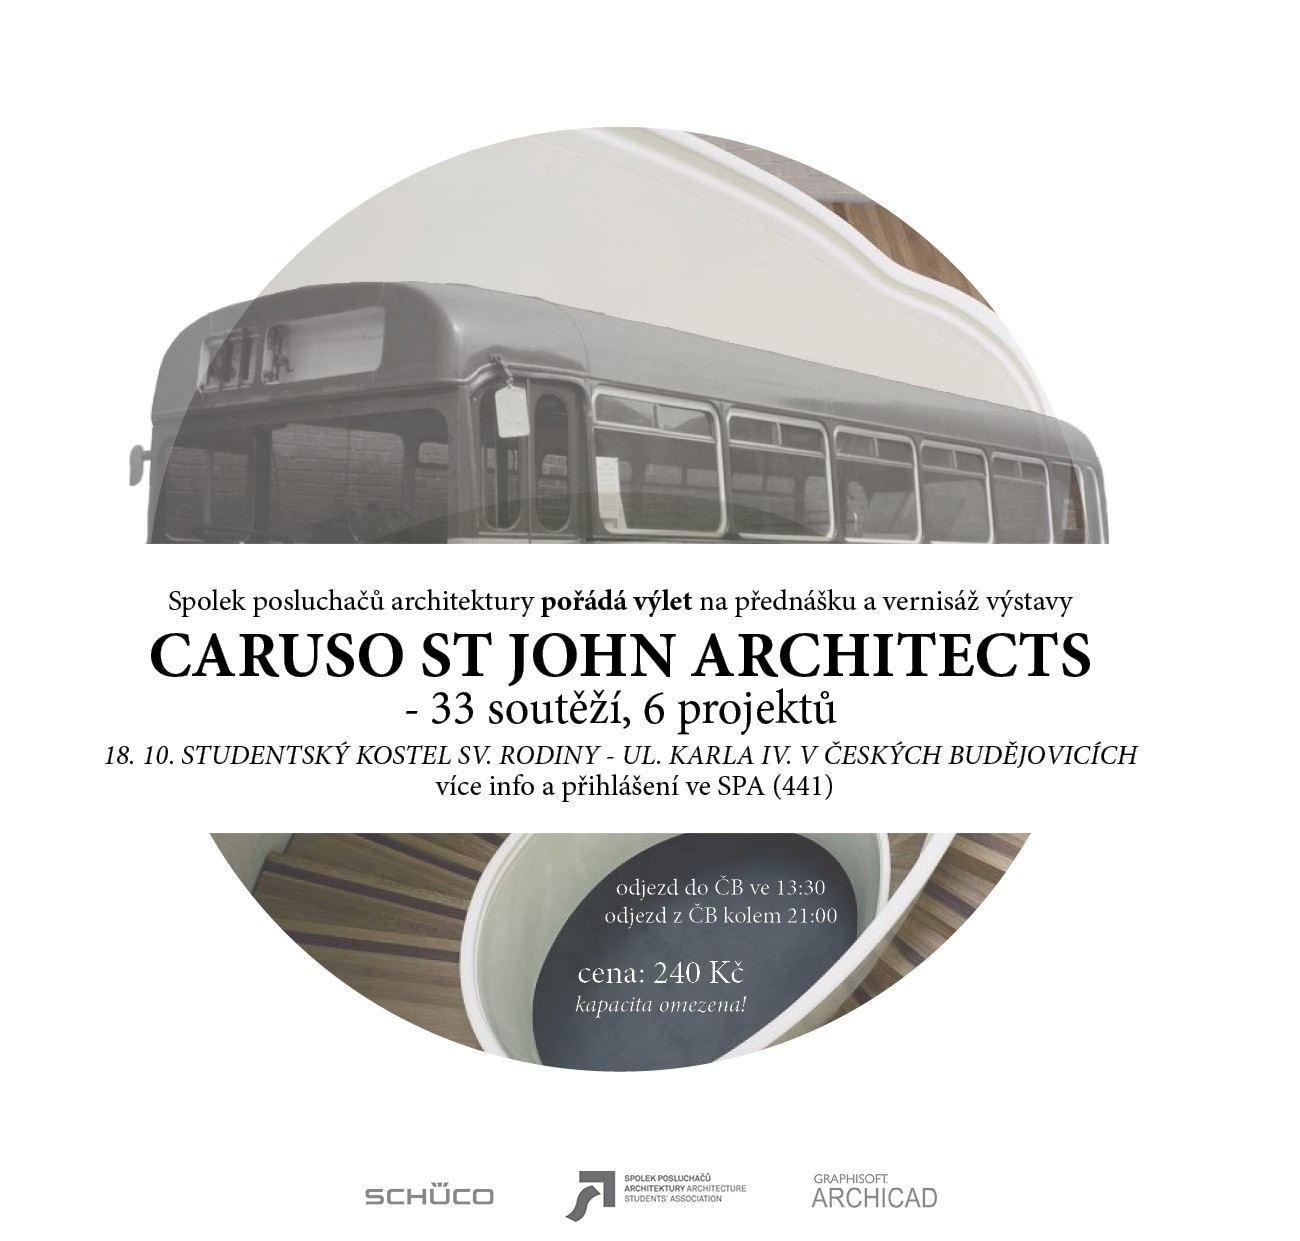 caruso-st-john-architects